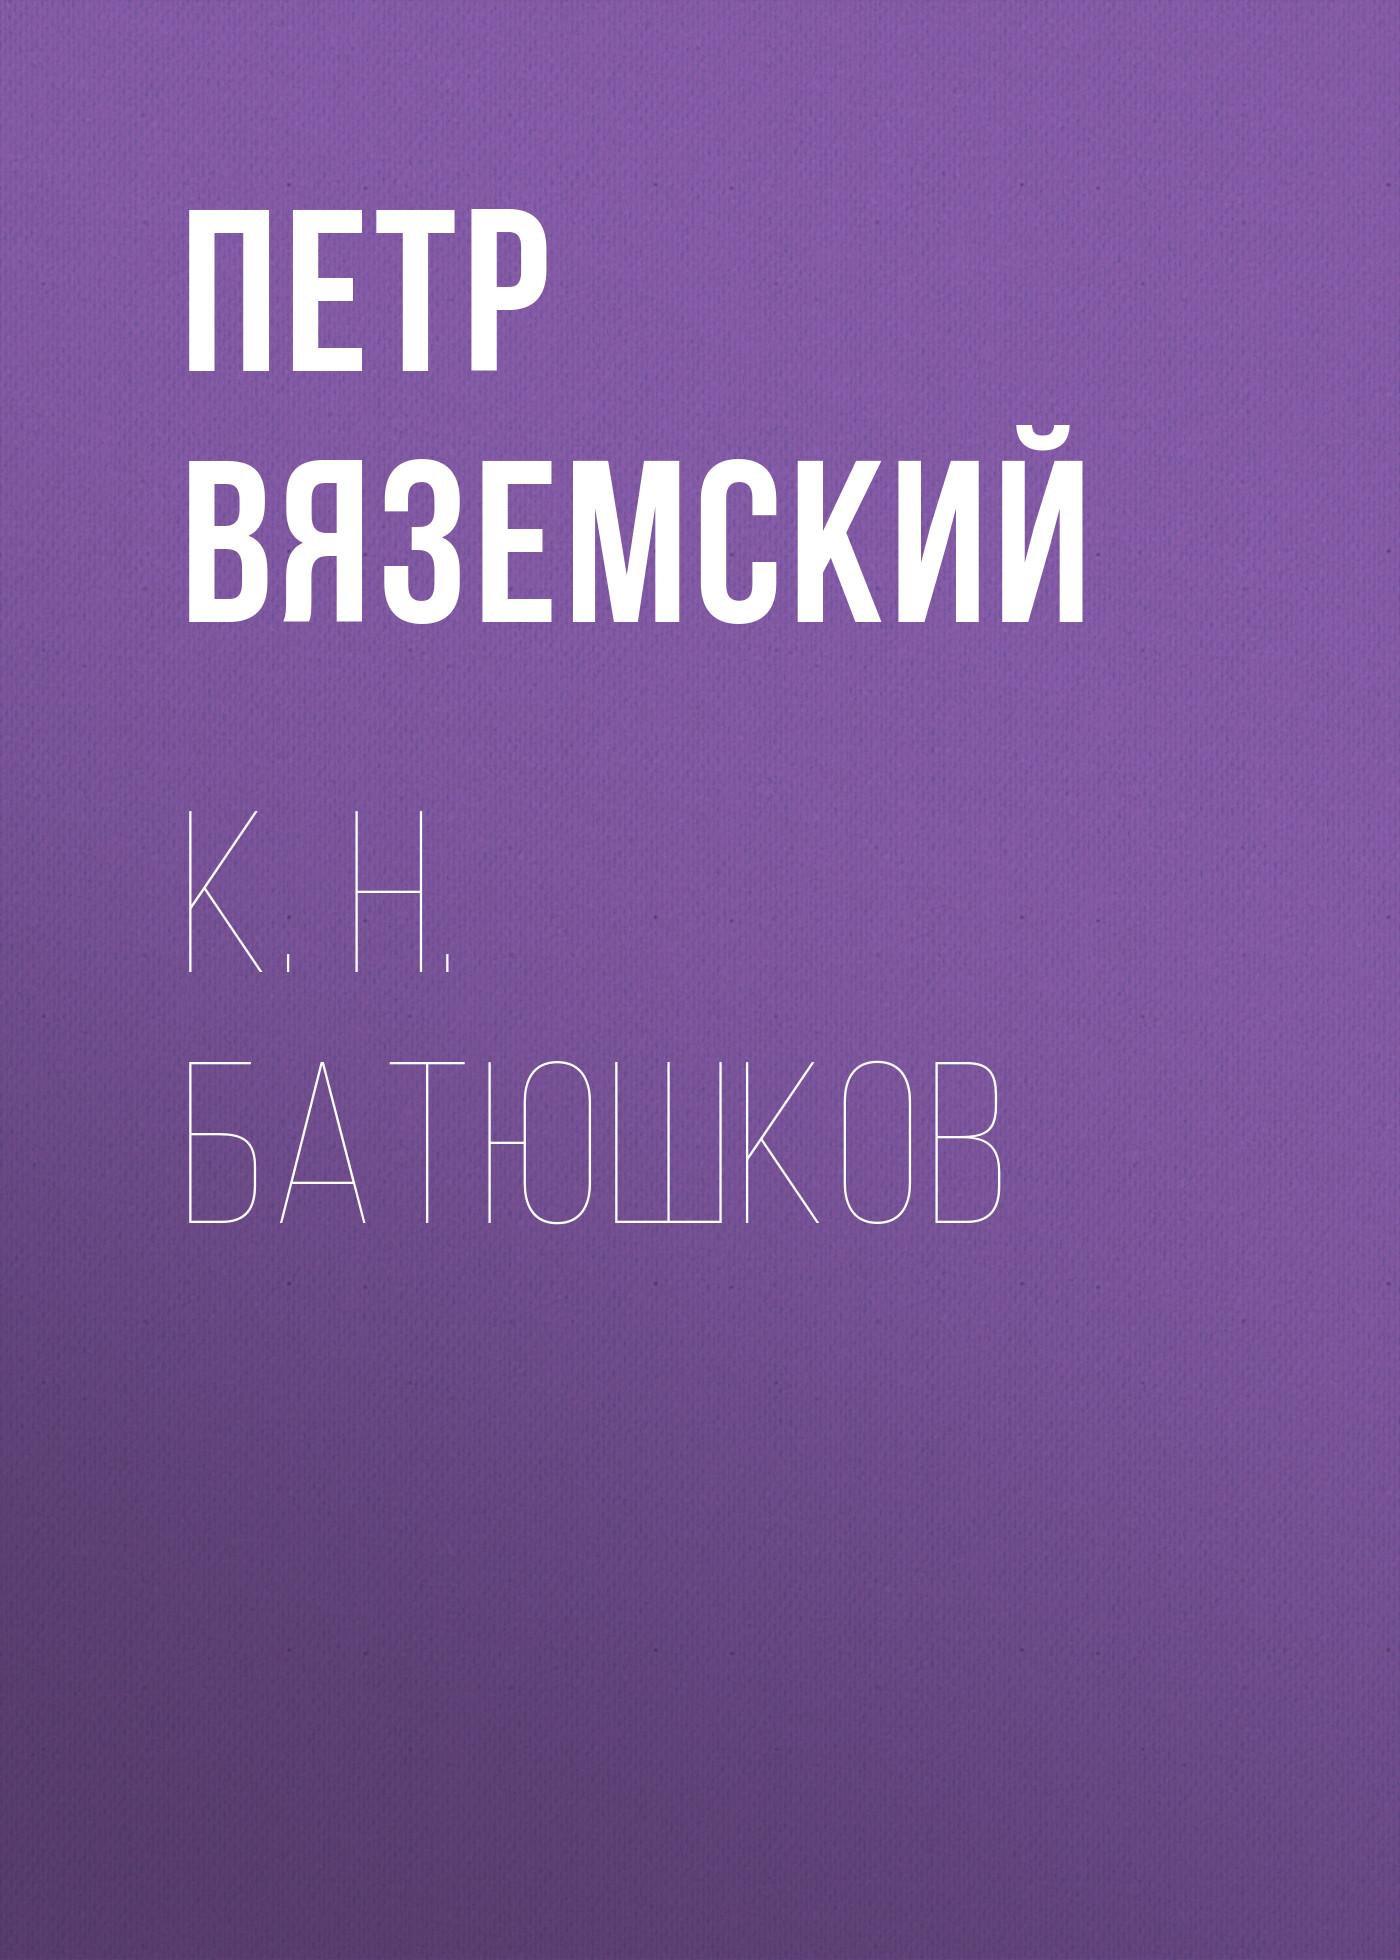 Петр Вяземский К. Н. Батюшков батюшков к к н батюшков сочинения комплект из 2 книг